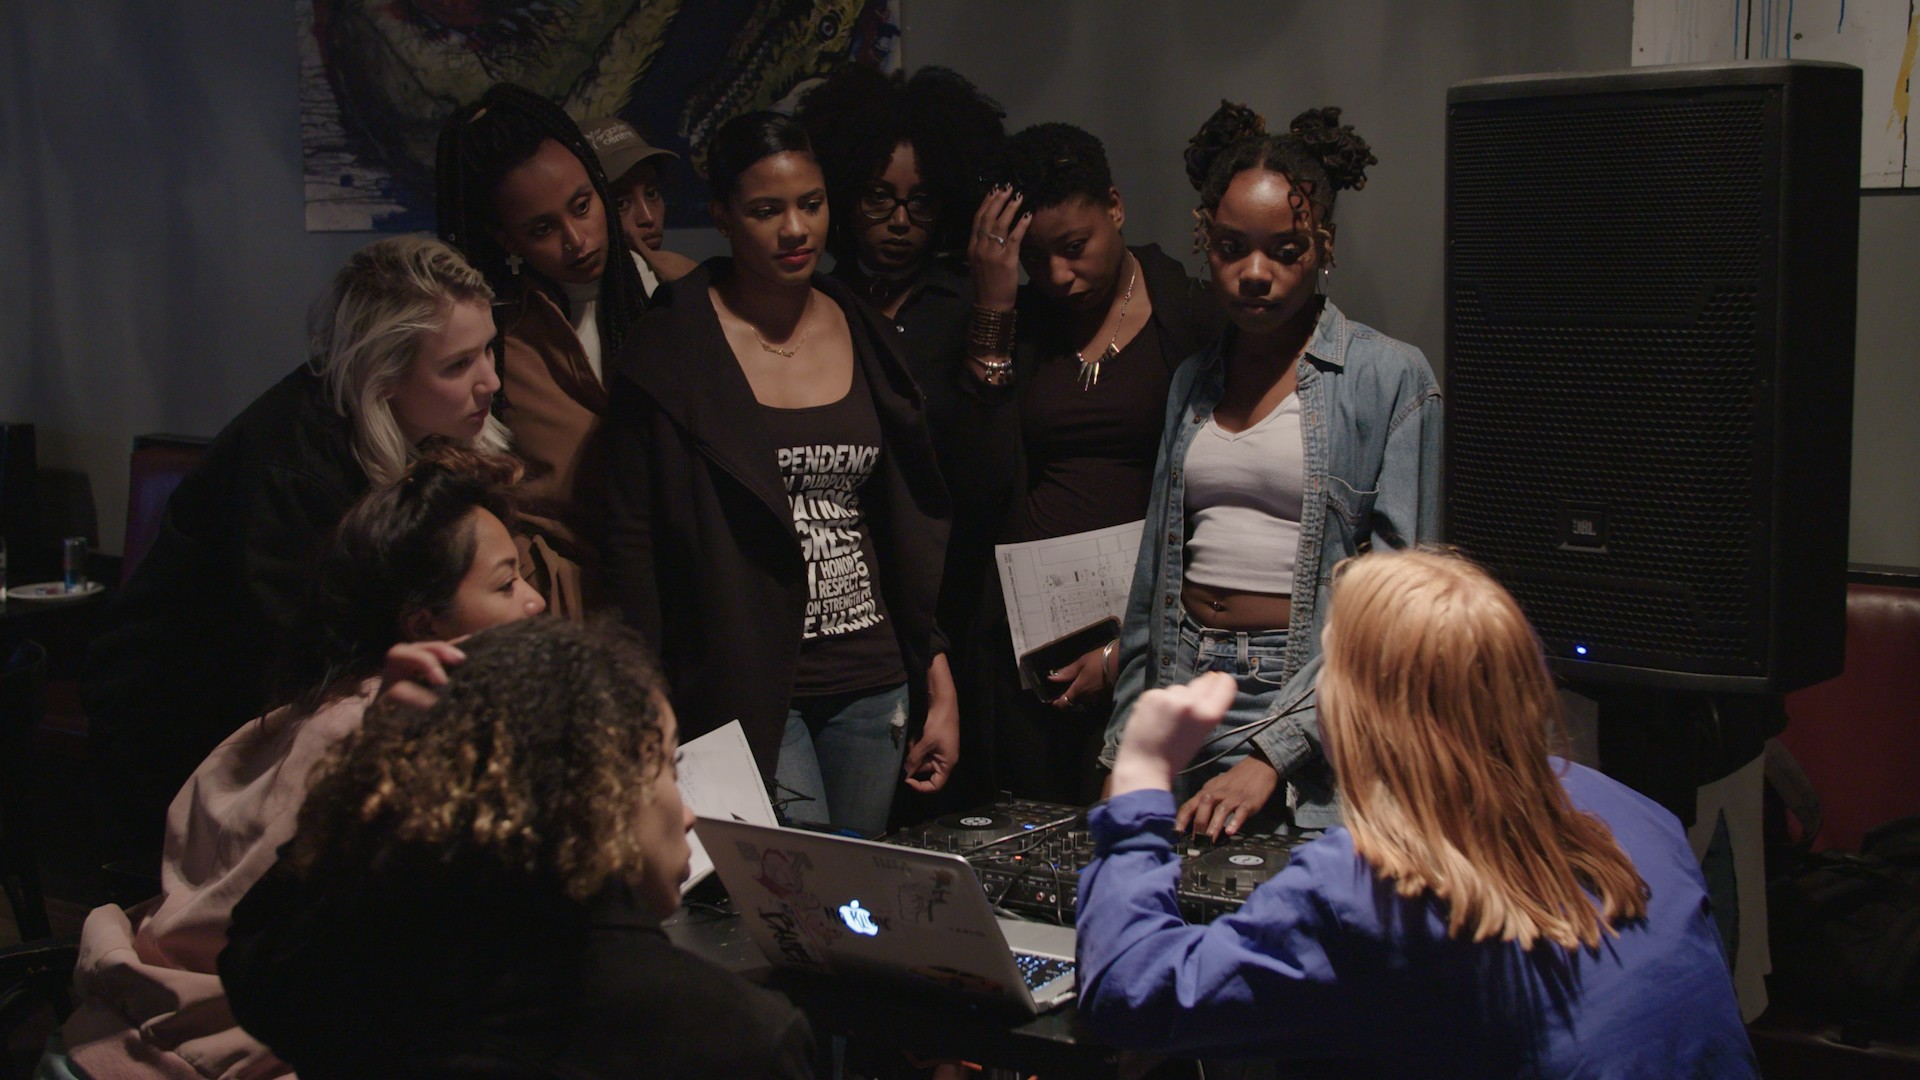 Go Behind-the-Scenes of Toronto's First Female-Friendly DJ Workshop